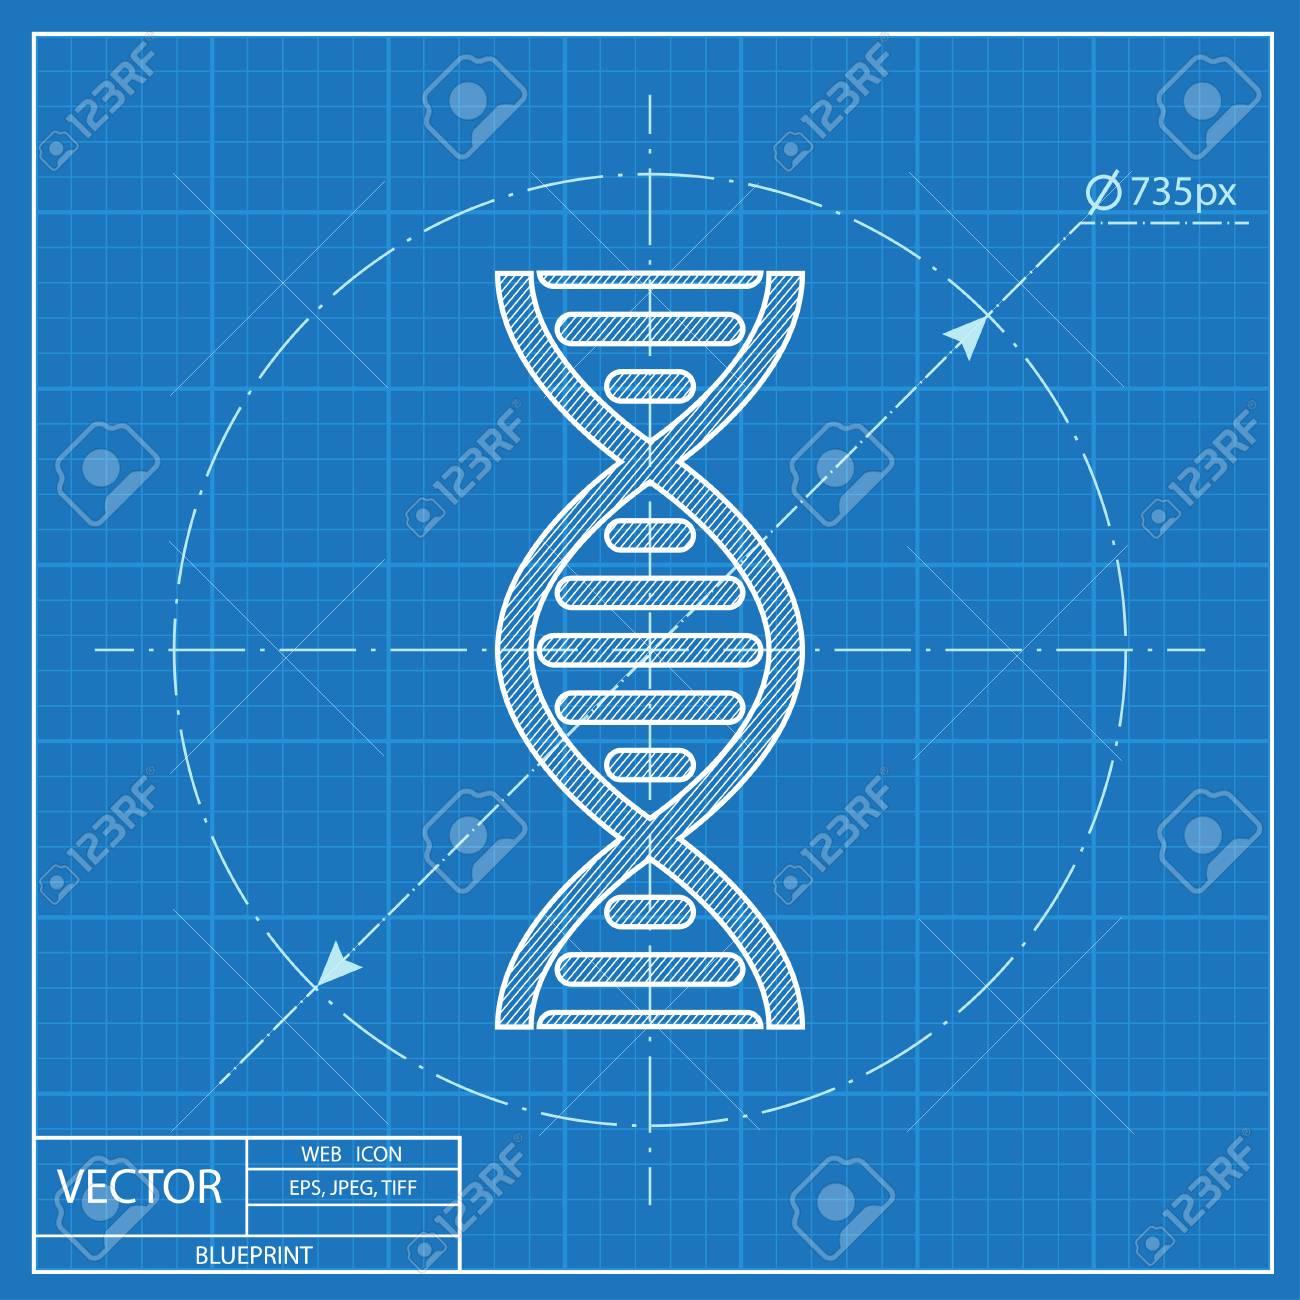 Vector dna molecule blueprint icon royalty free cliparts vectors vector vector dna molecule blueprint icon malvernweather Choice Image